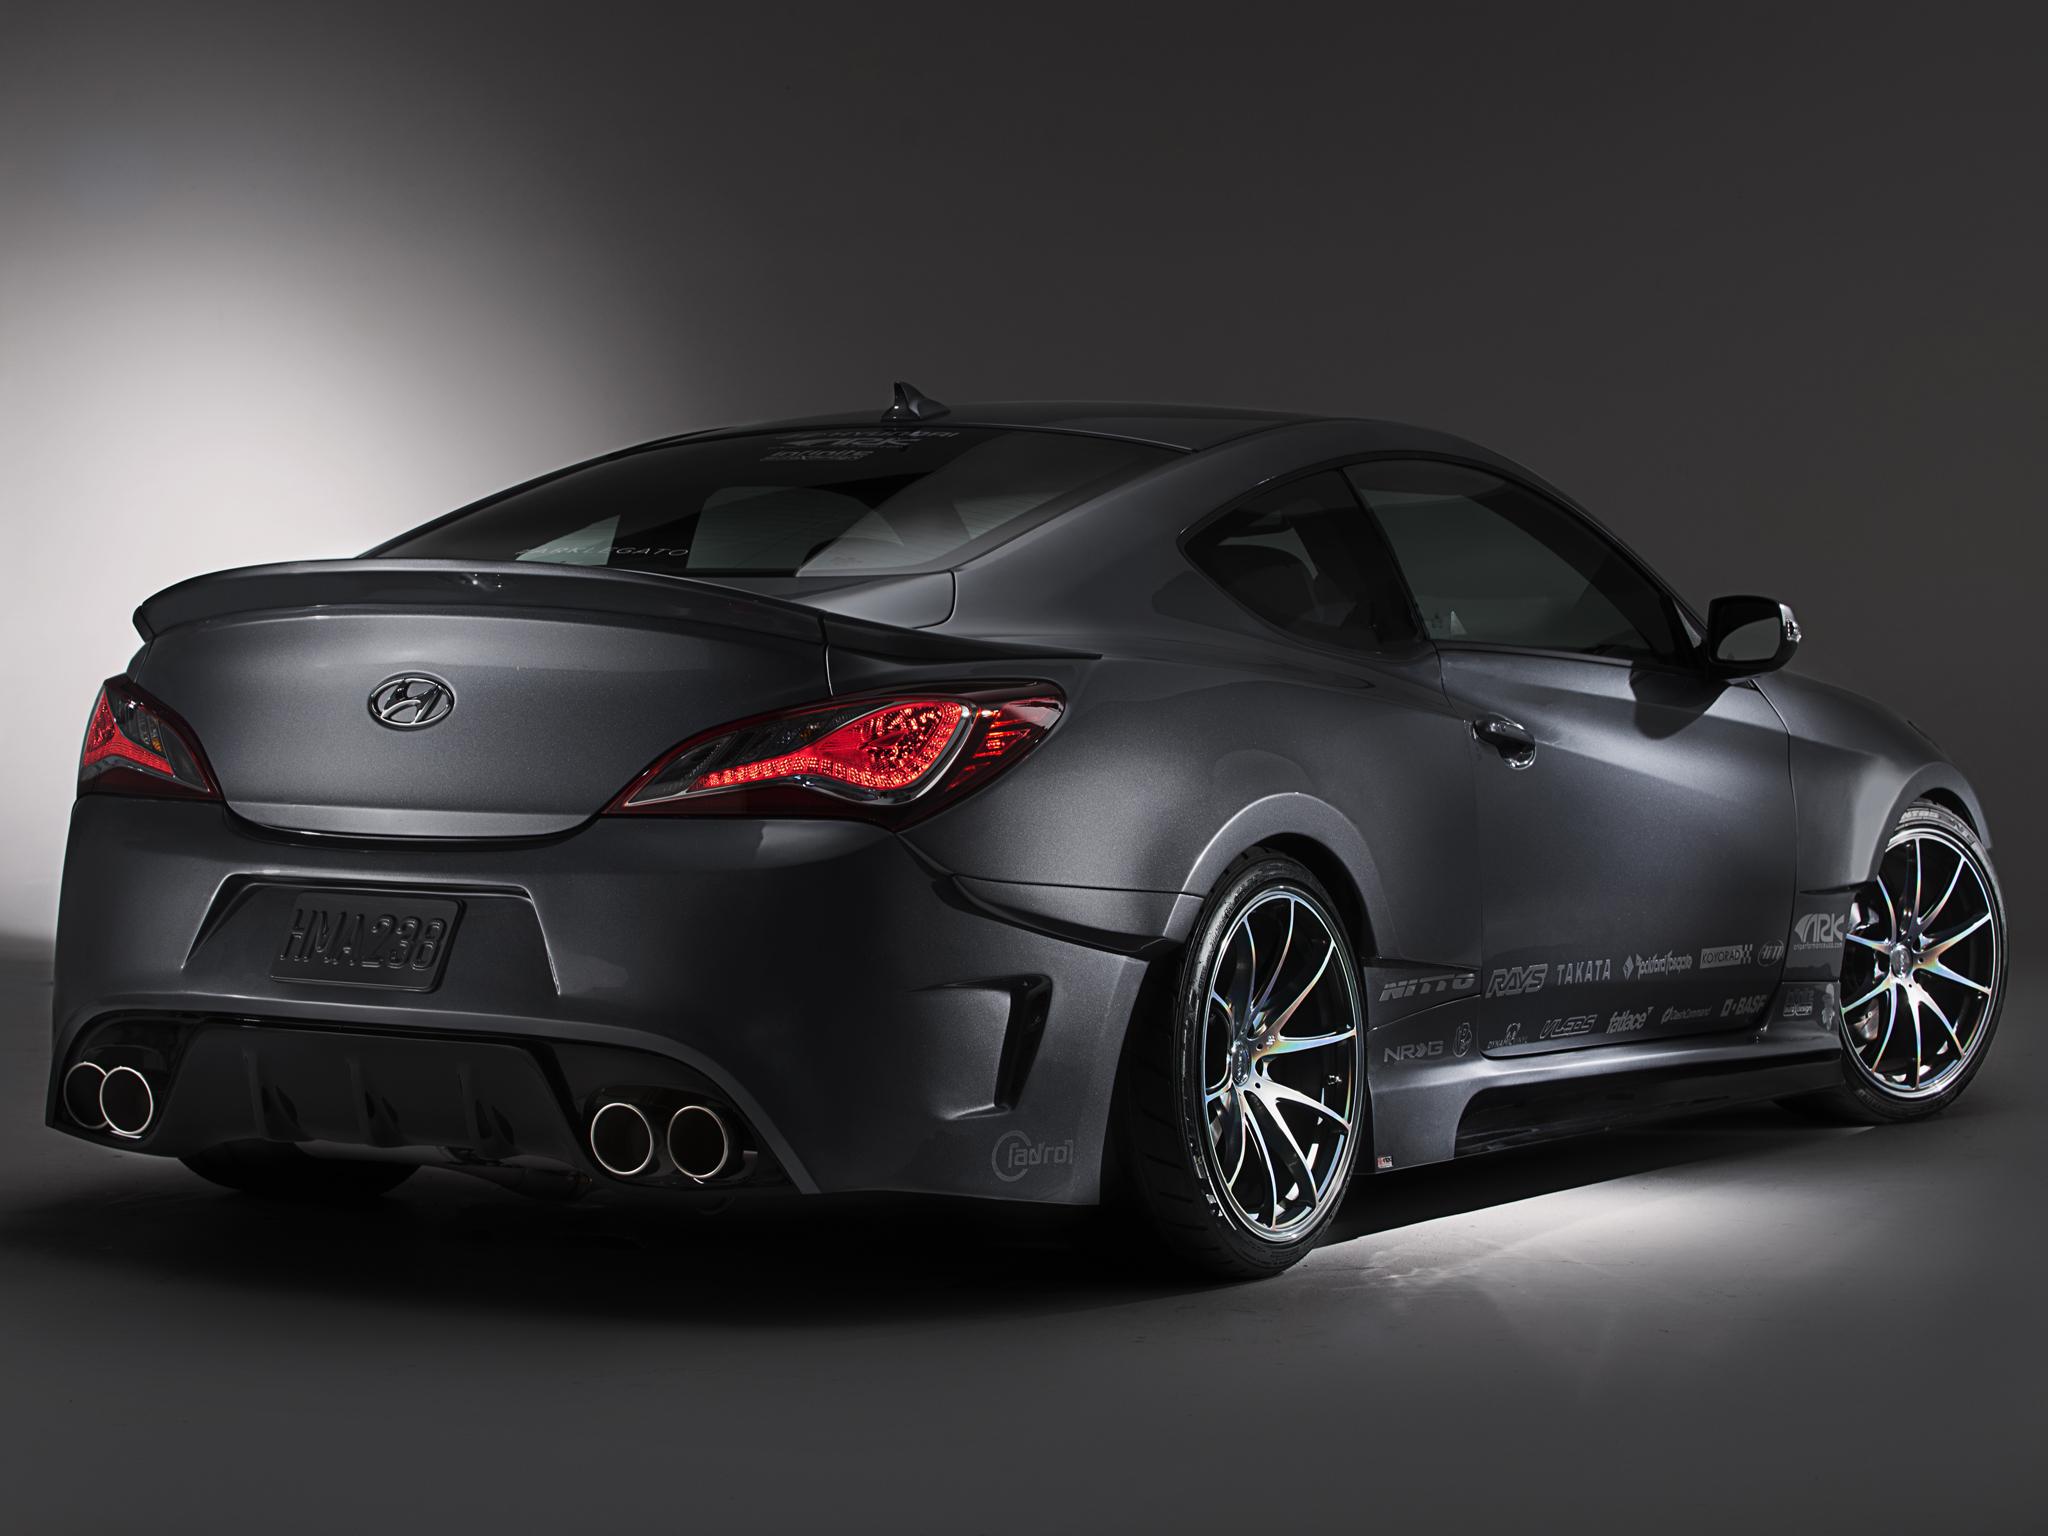 2013 Ark Performance Hyundai Genesis Coupe Legato Tuning H